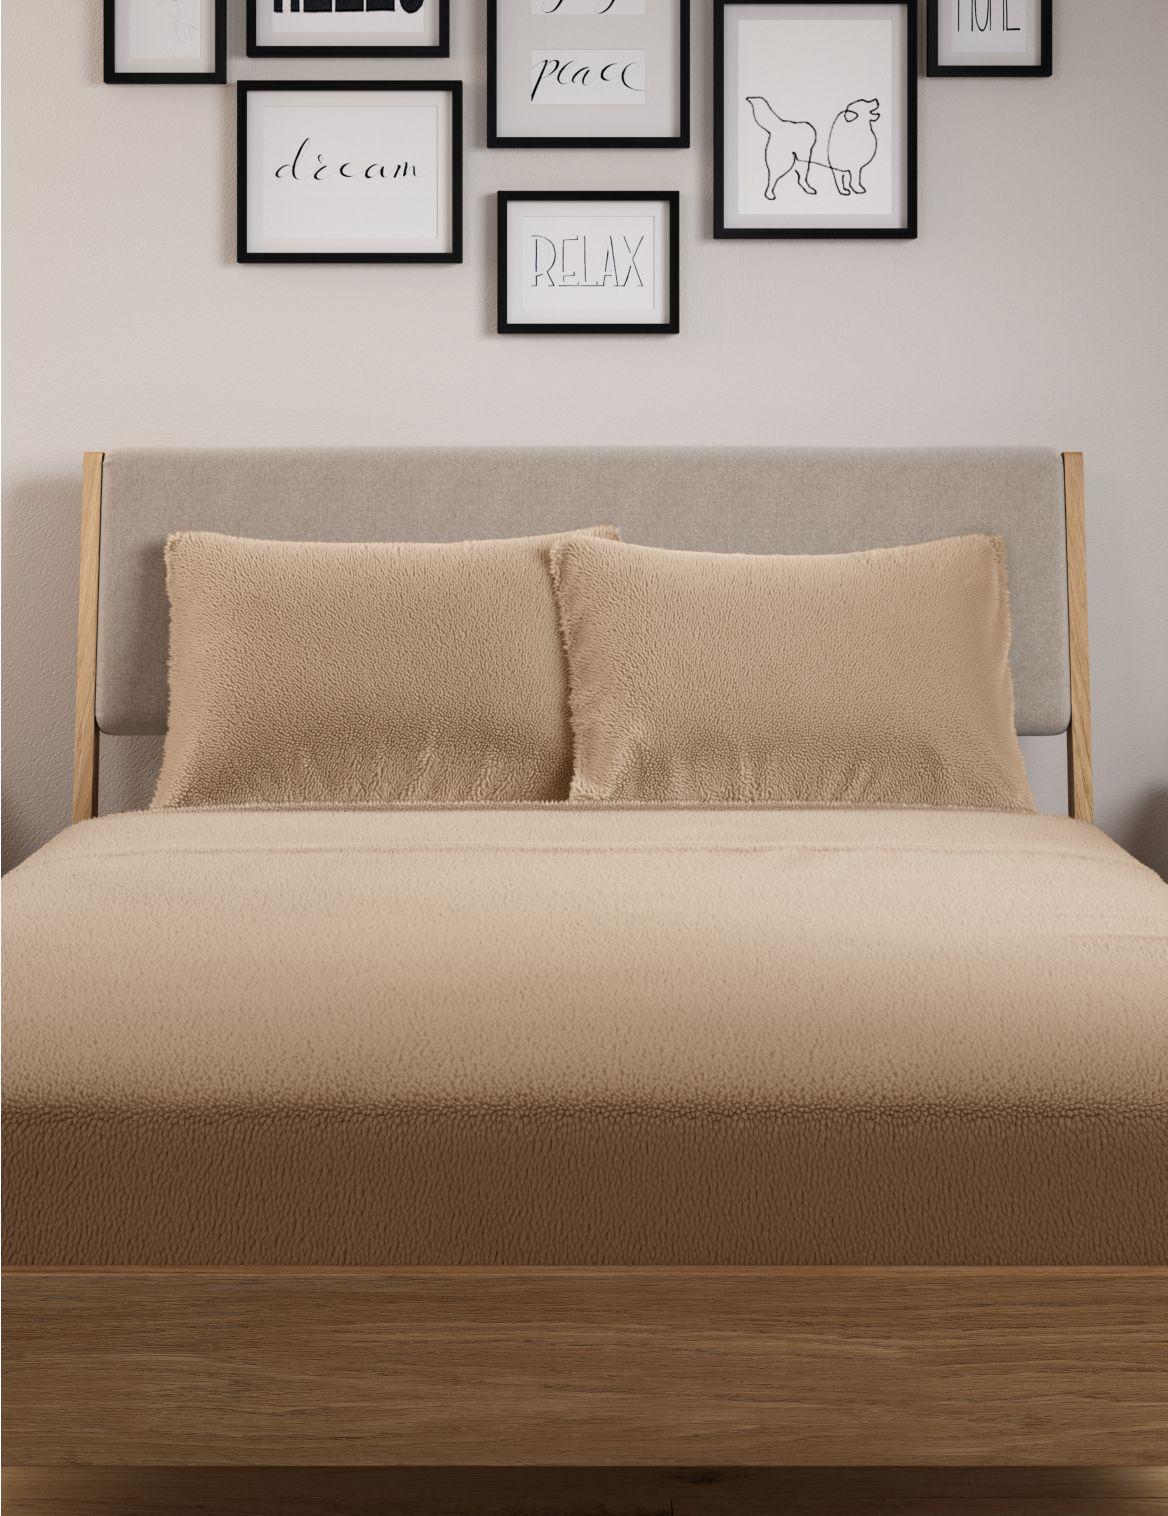 2 Pack Teddy Fleece Standard Pillowcases Cream